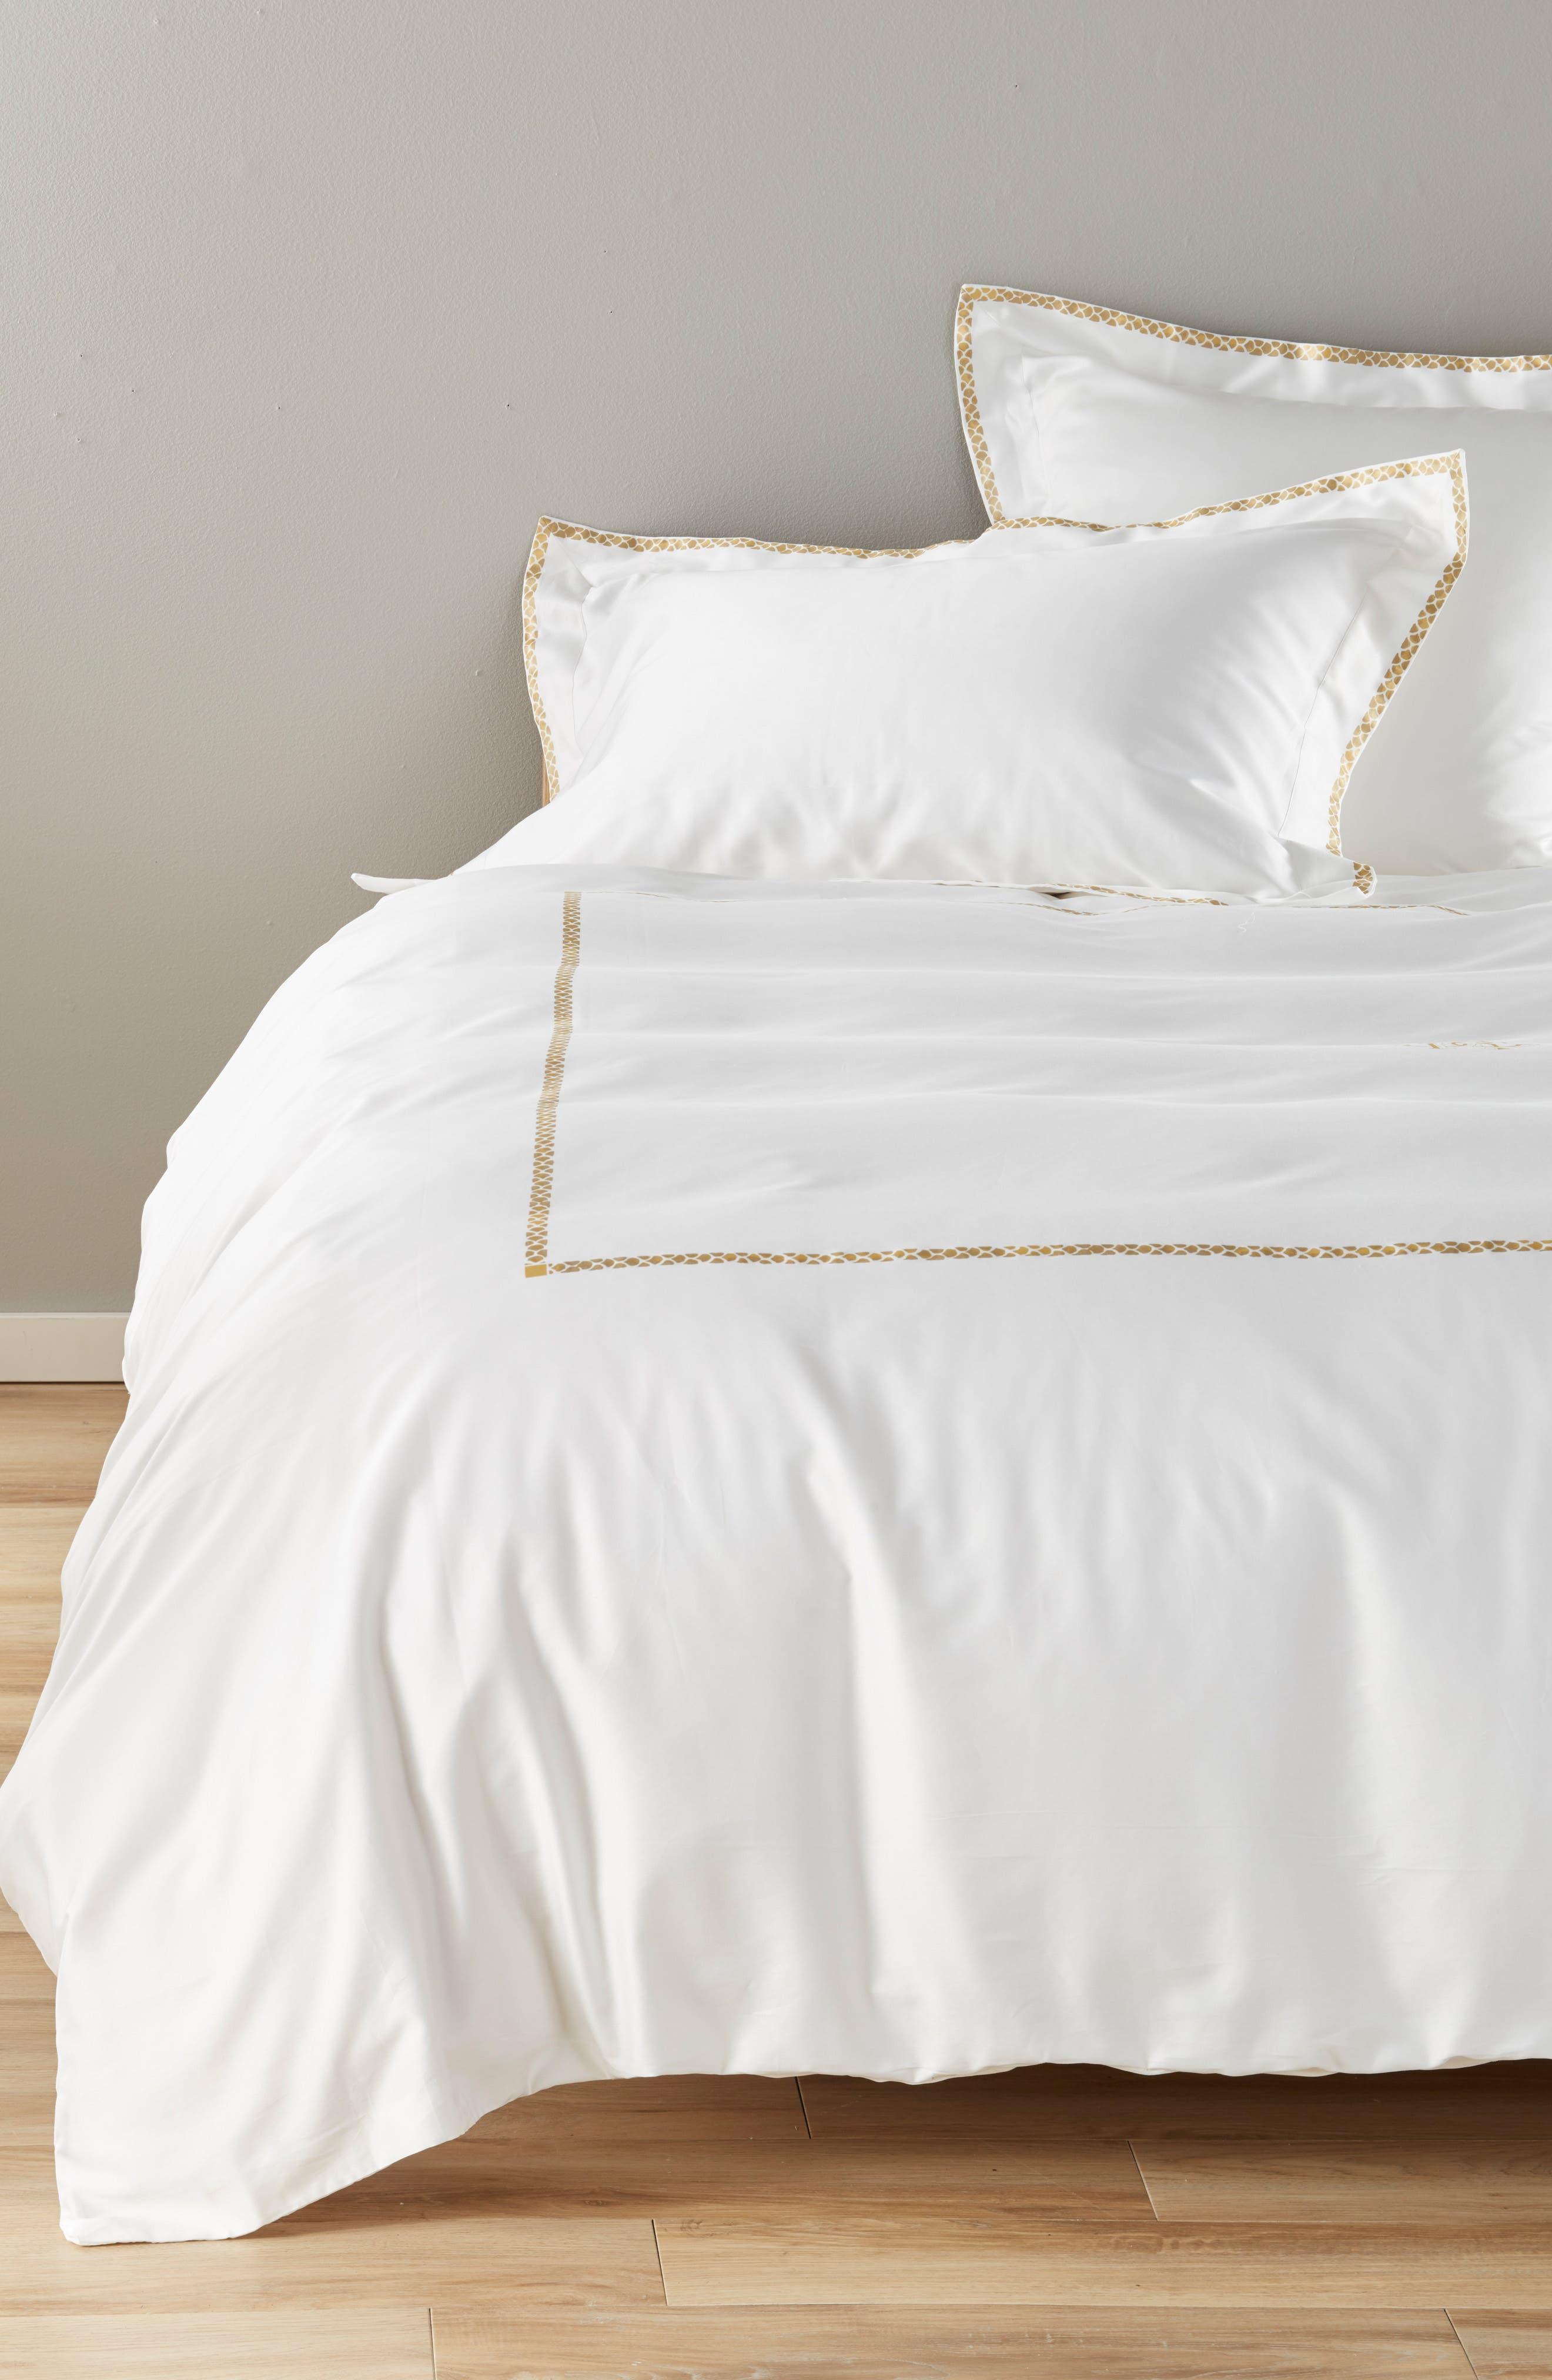 Roberto Cavalli New Gold Duvet Cover Size King  White